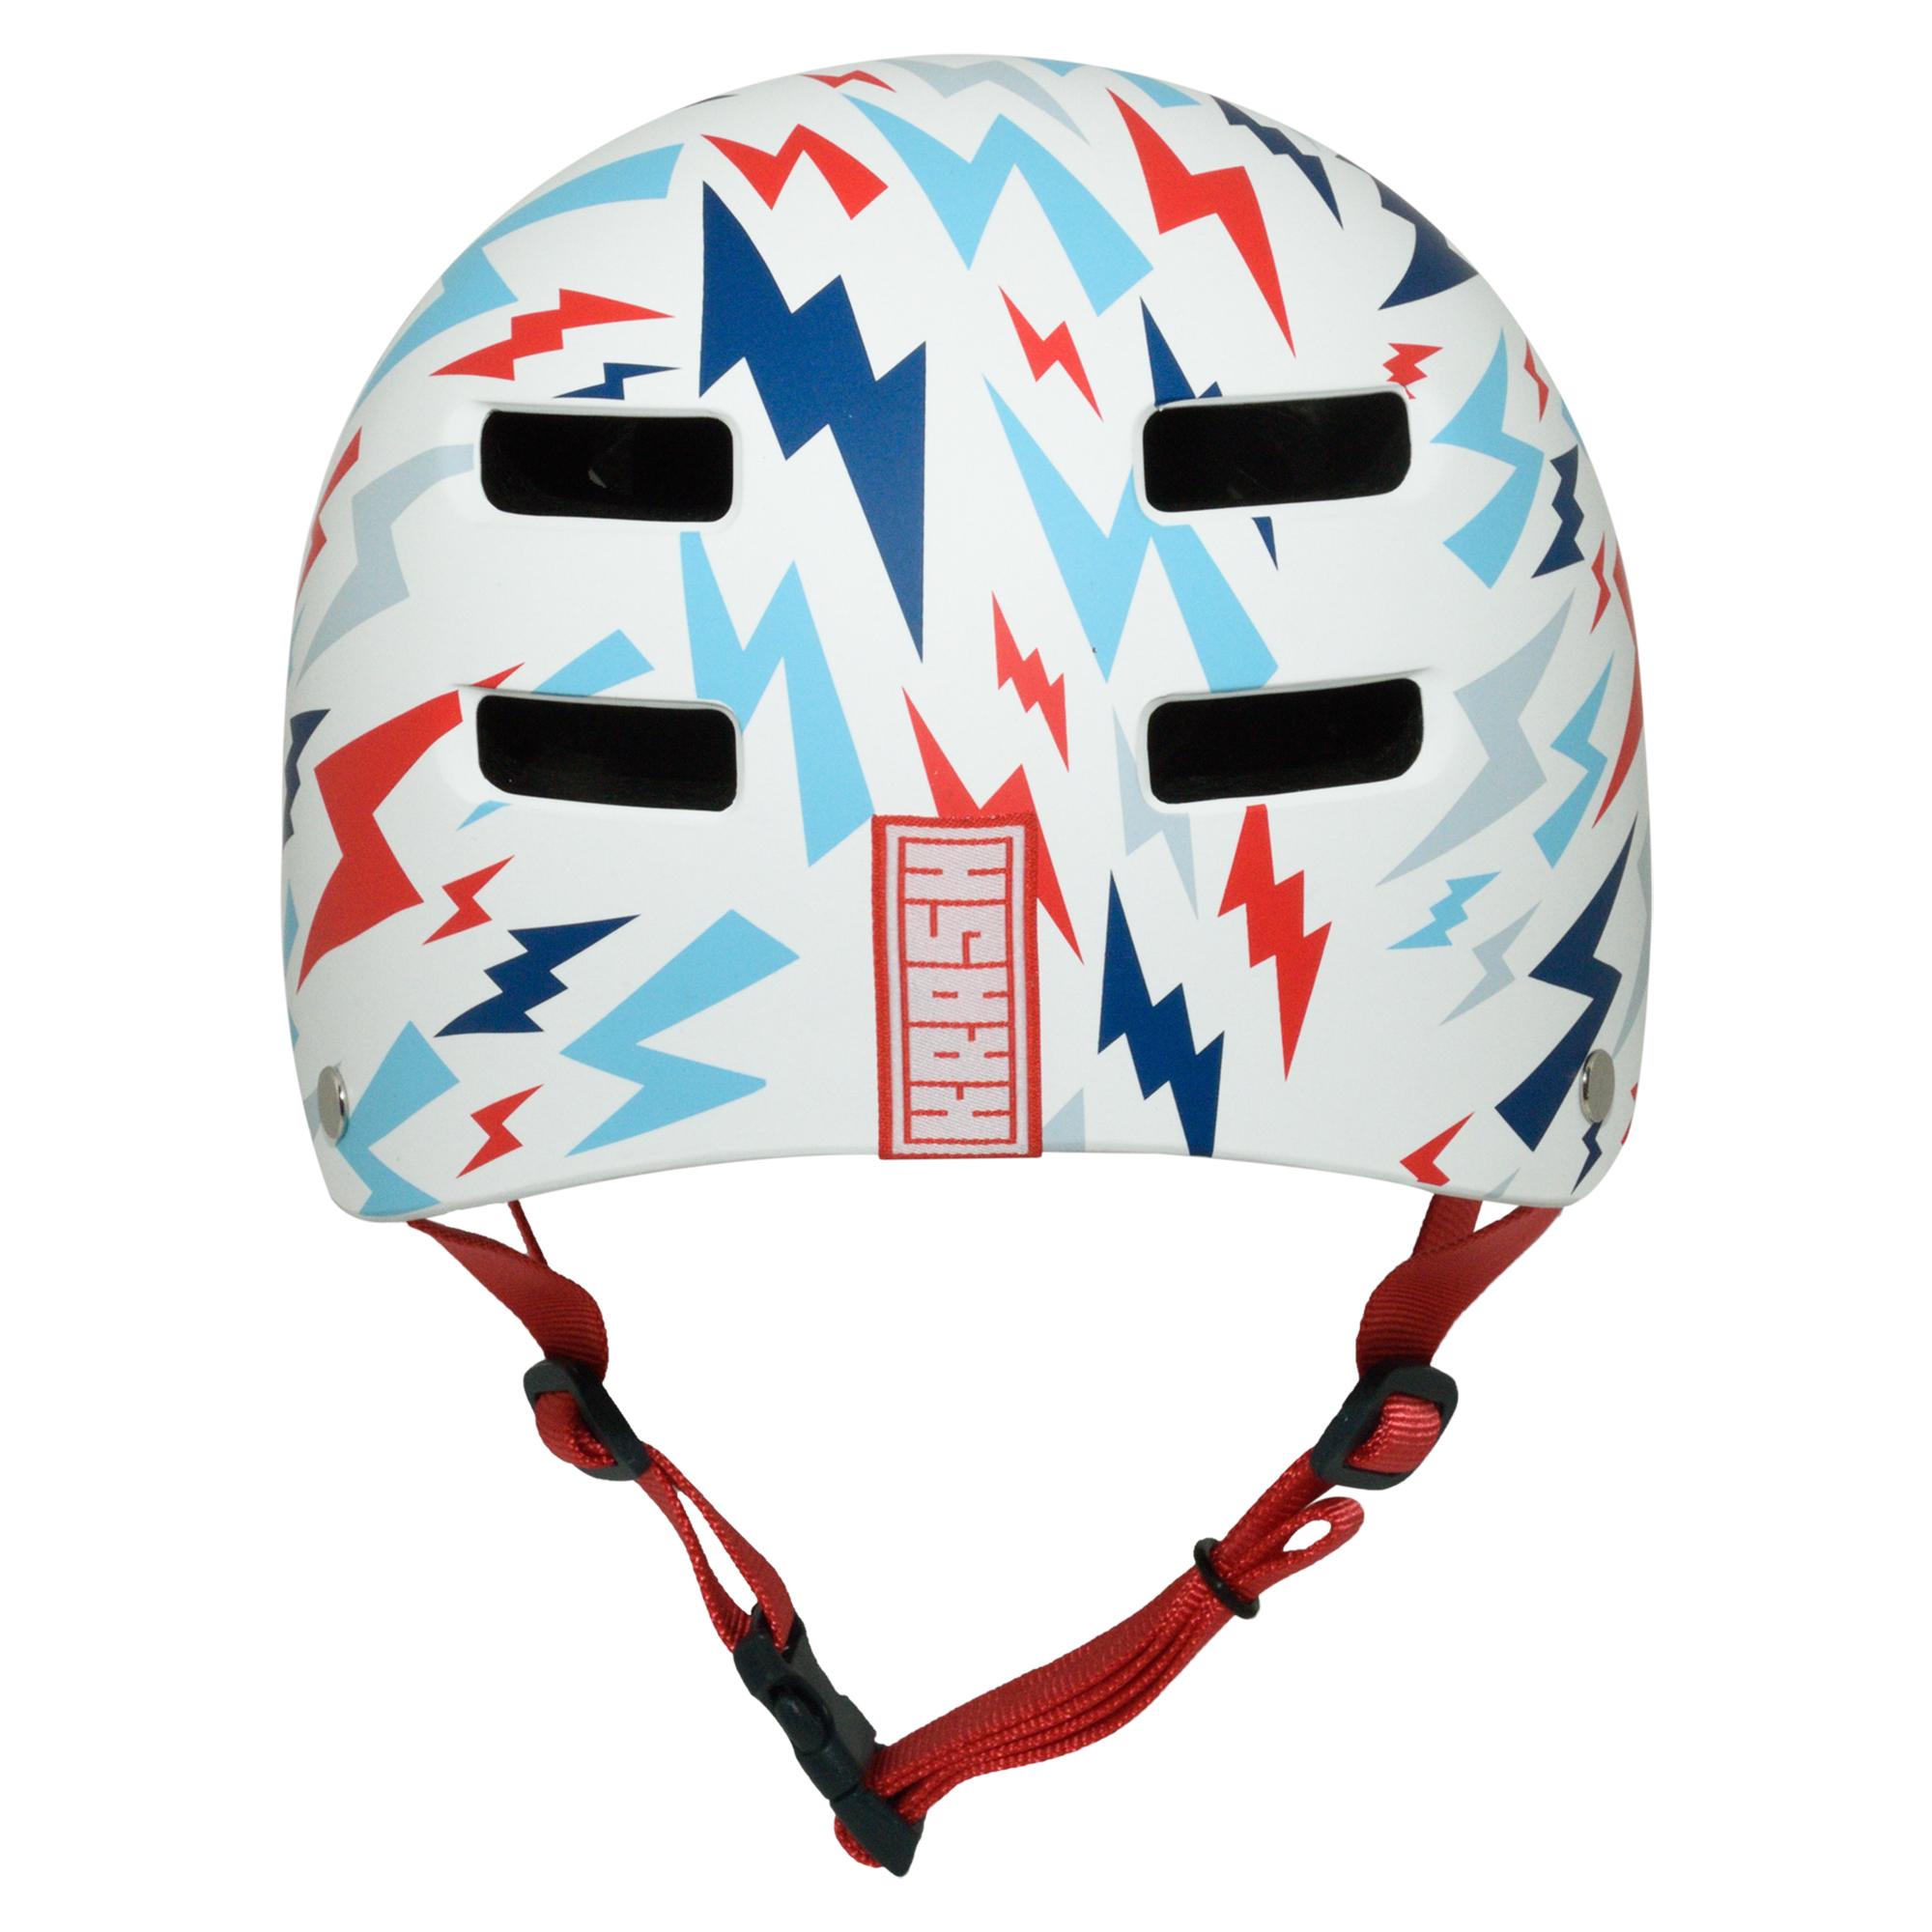 C Preme Krash Thunder Struck Helmet Cap S Bicycle Shop